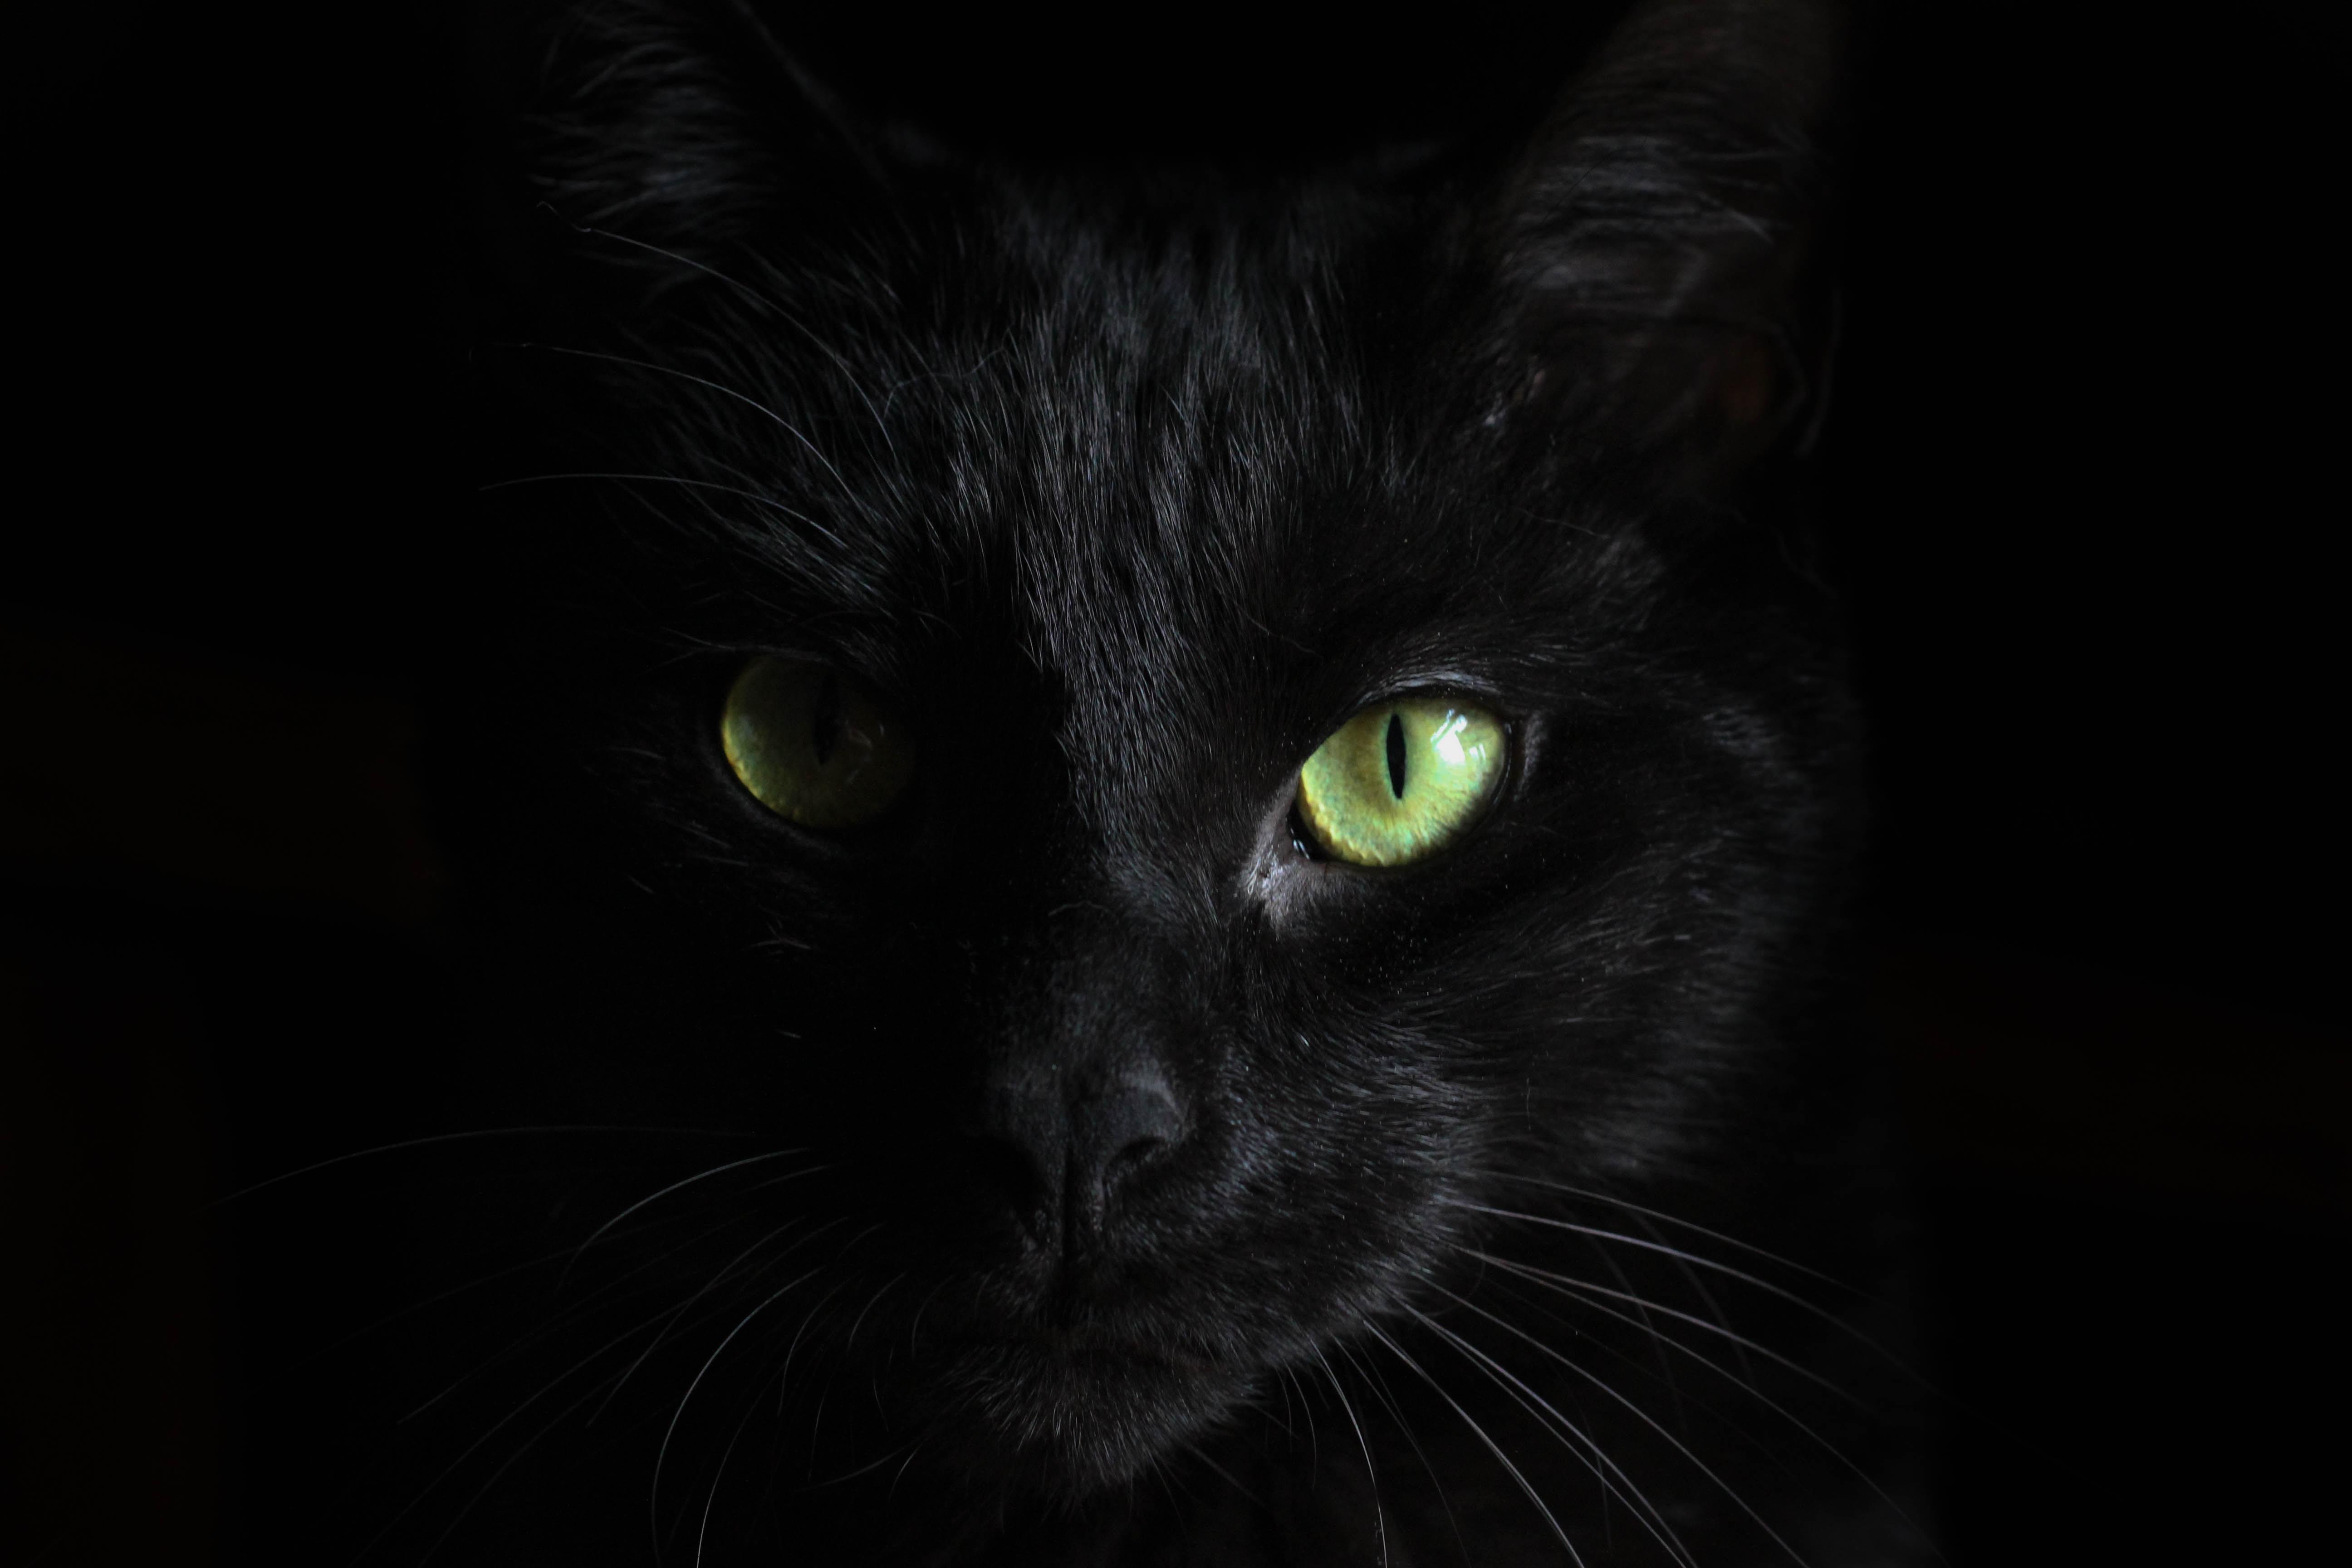 Black Background Pictures Download Free Images on Unsplash